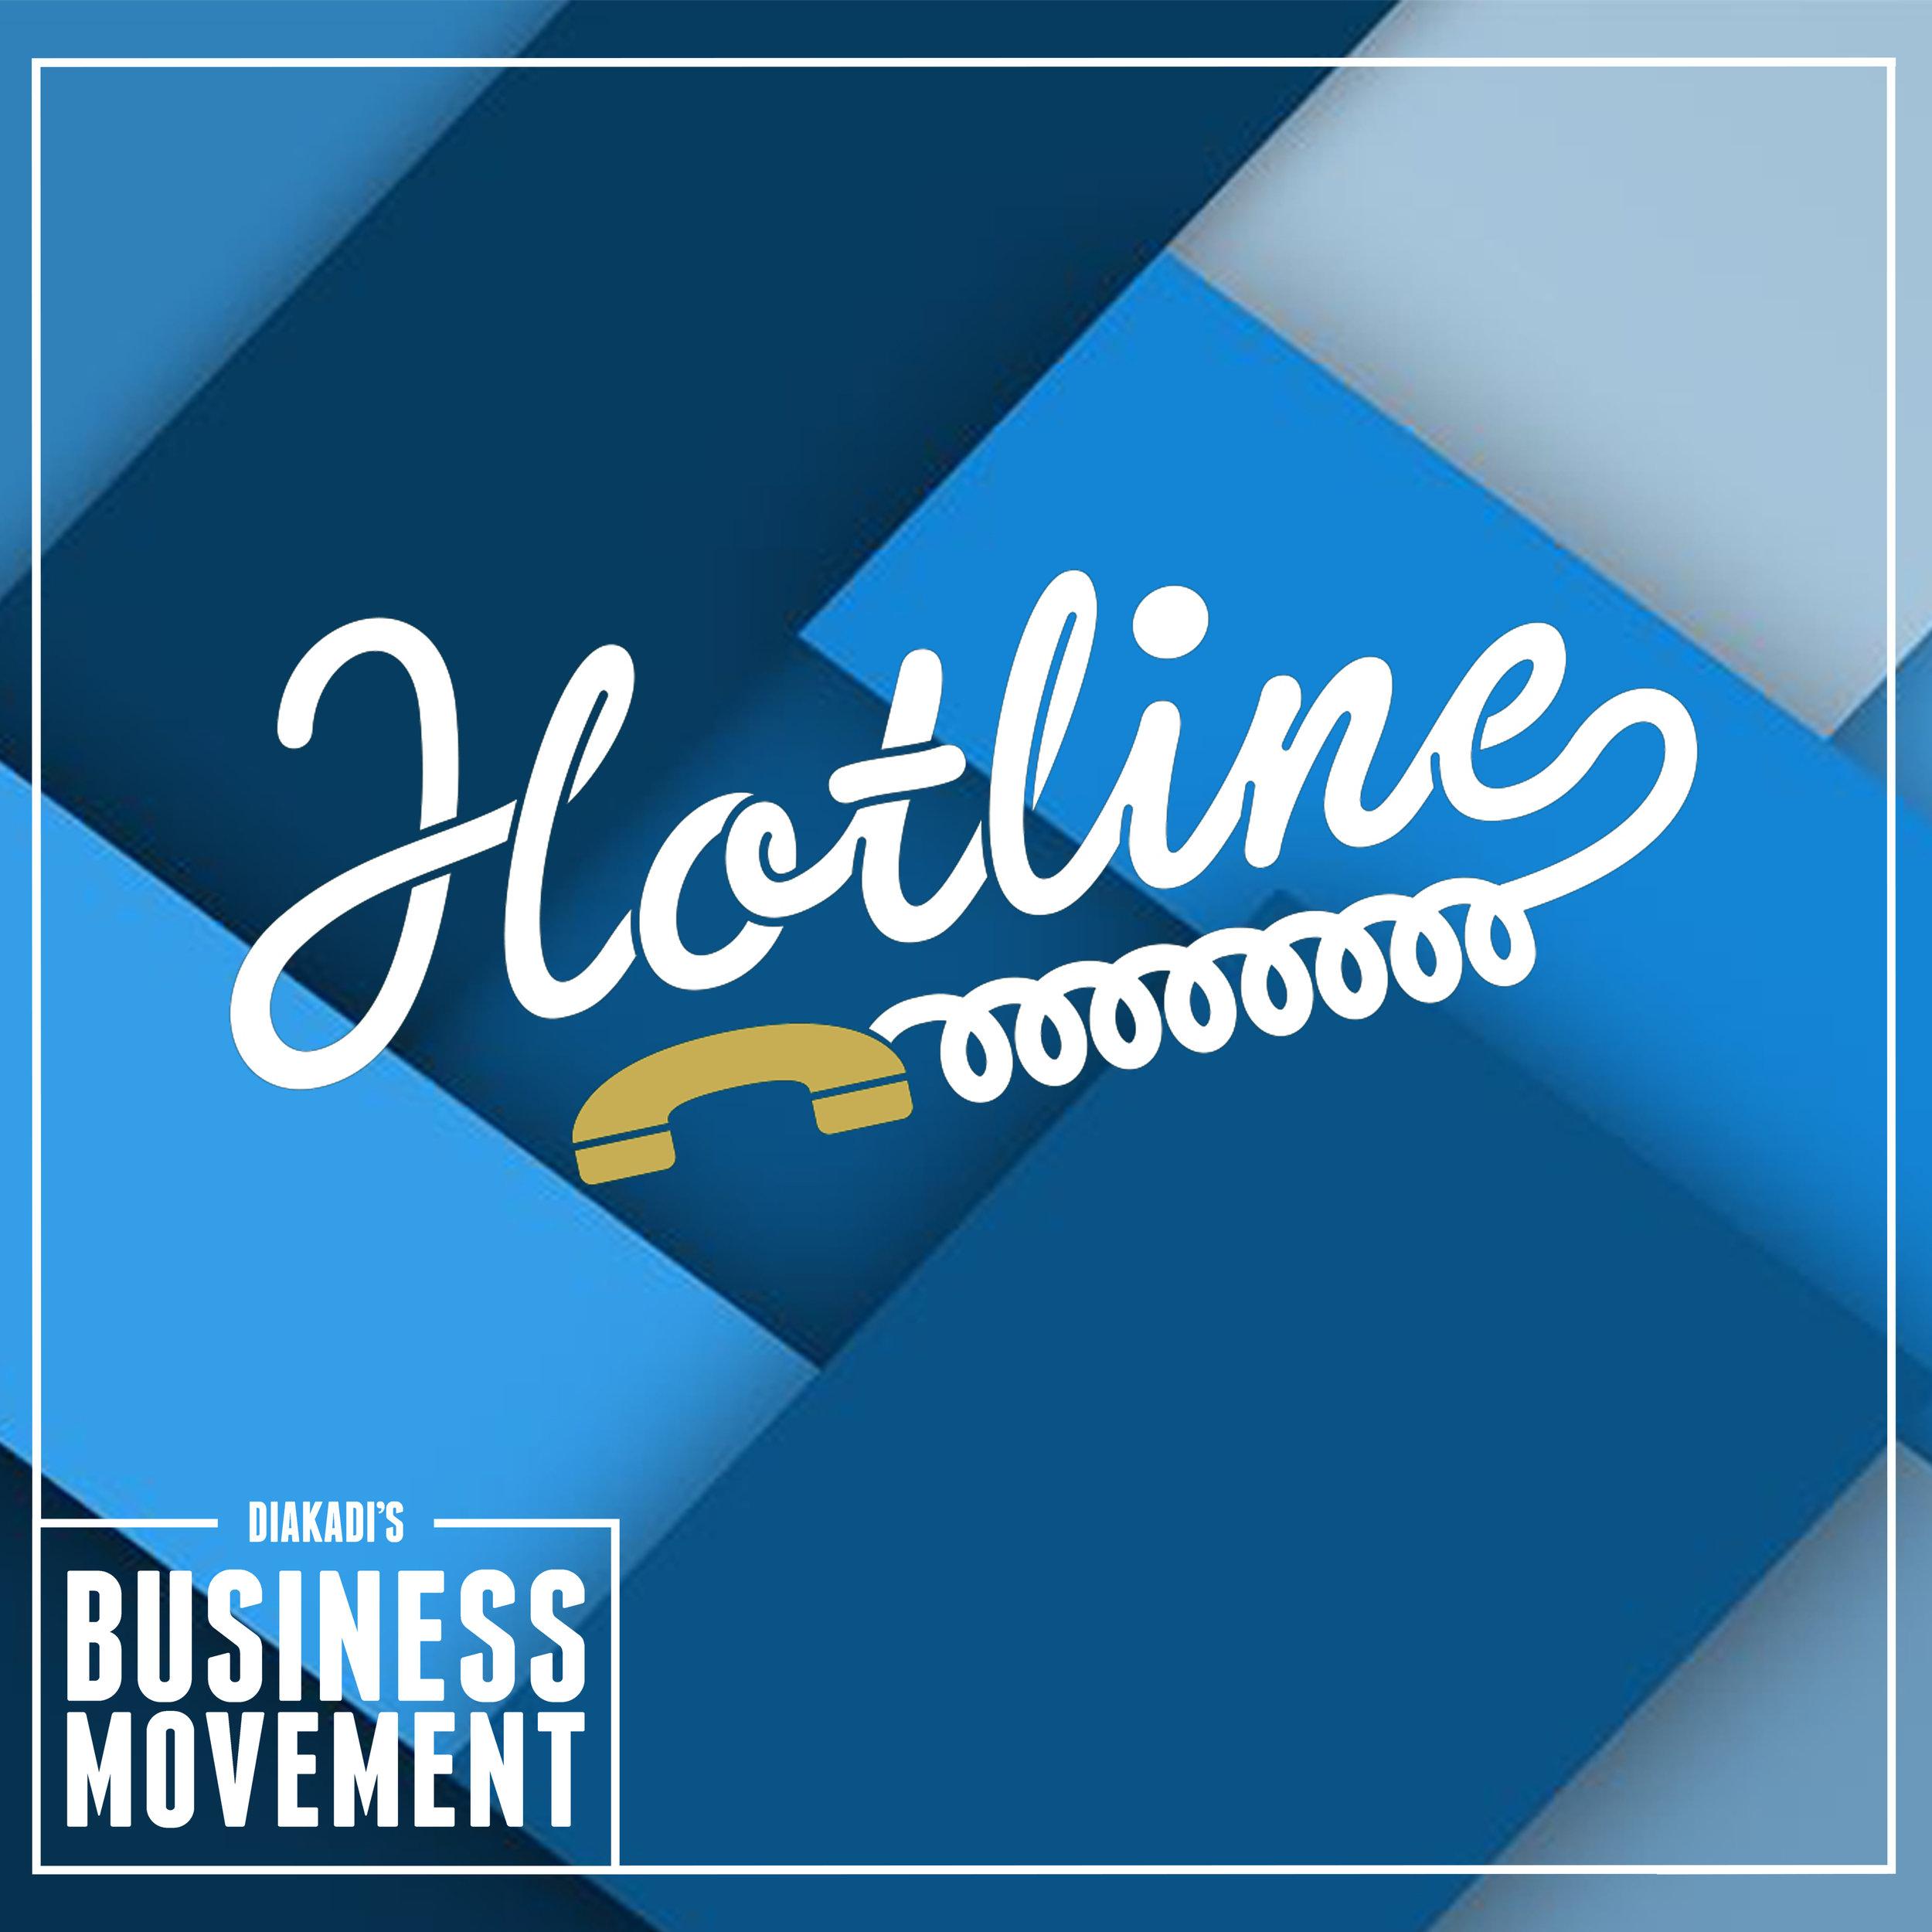 Business + Hotline + Questions + FAQ + Trainers